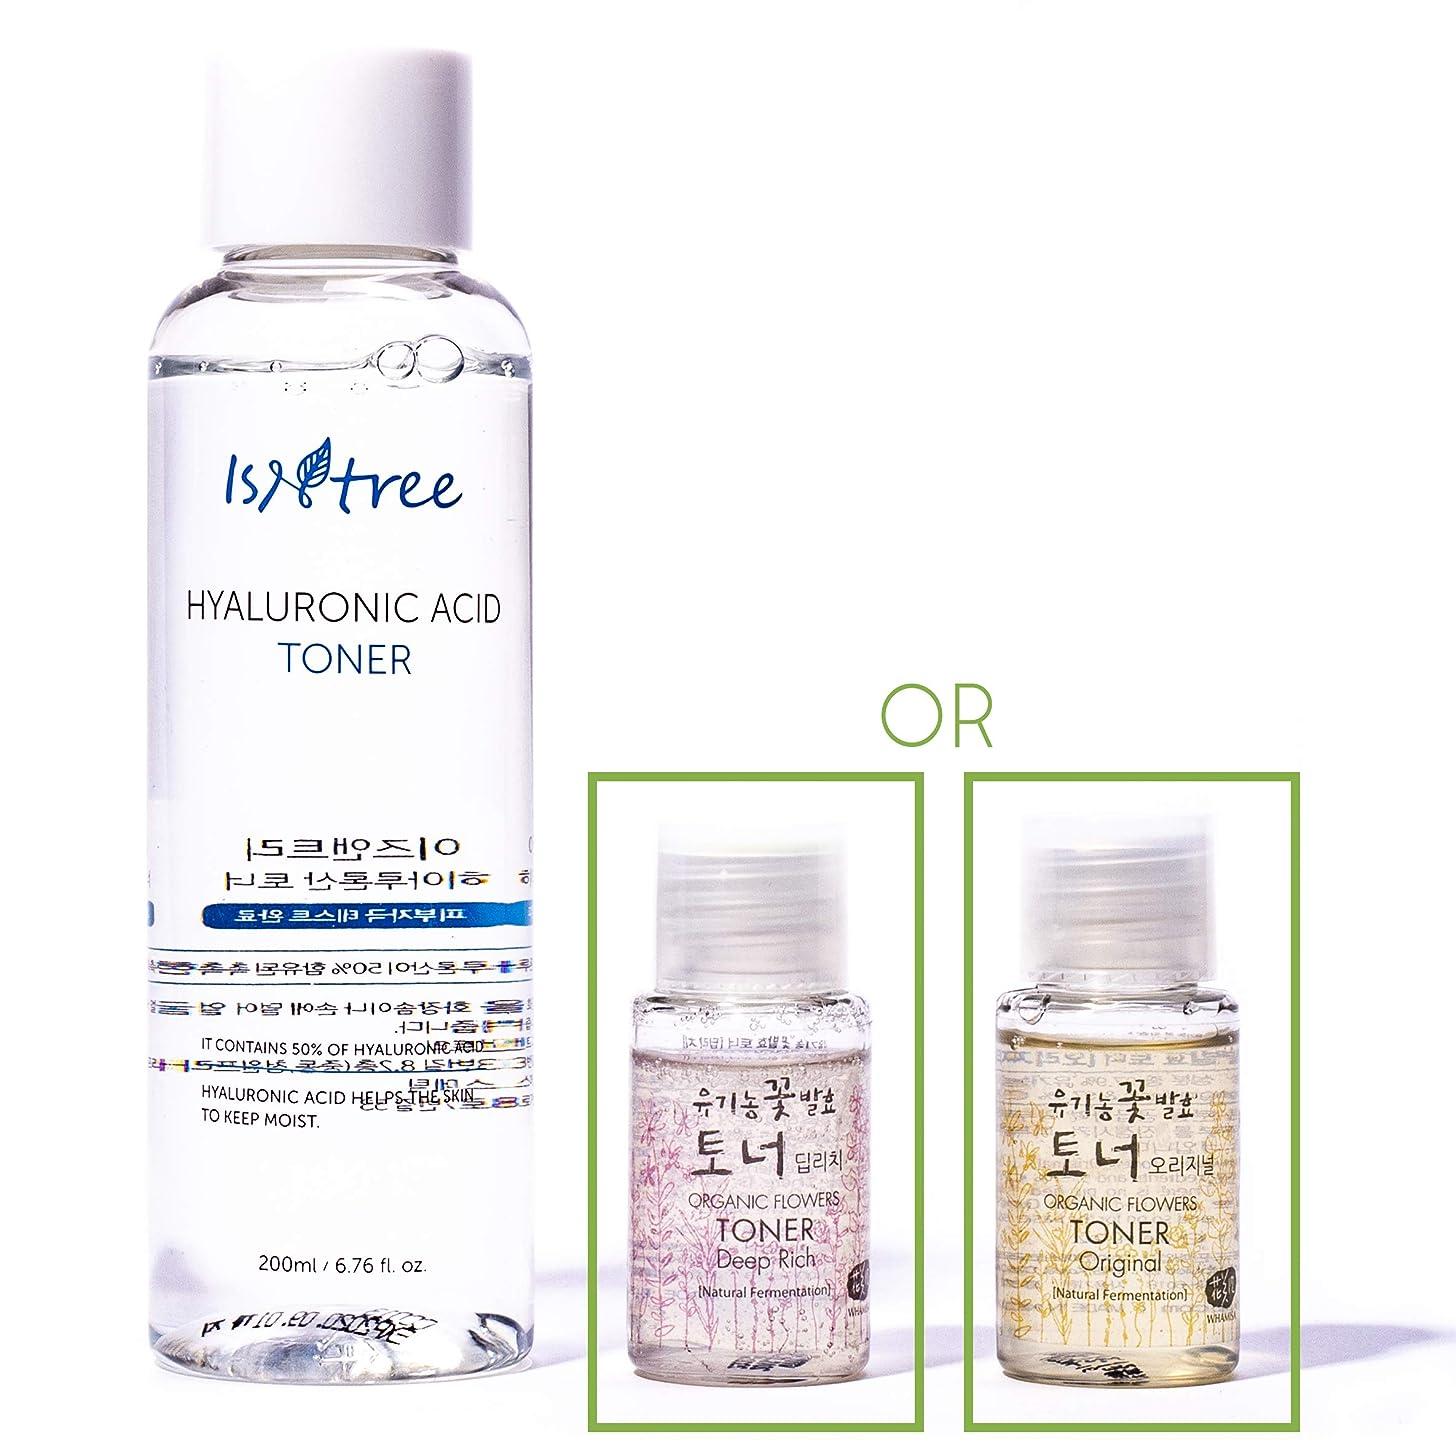 ISNTREE Hyaluronic Acid Toner 200ml & Whamisa Deep rich Essence Toner Mini 20ml | Deep Moisturizing, Soothing, Nourishing | Adenosine & Allantoin | Limited QTY ||